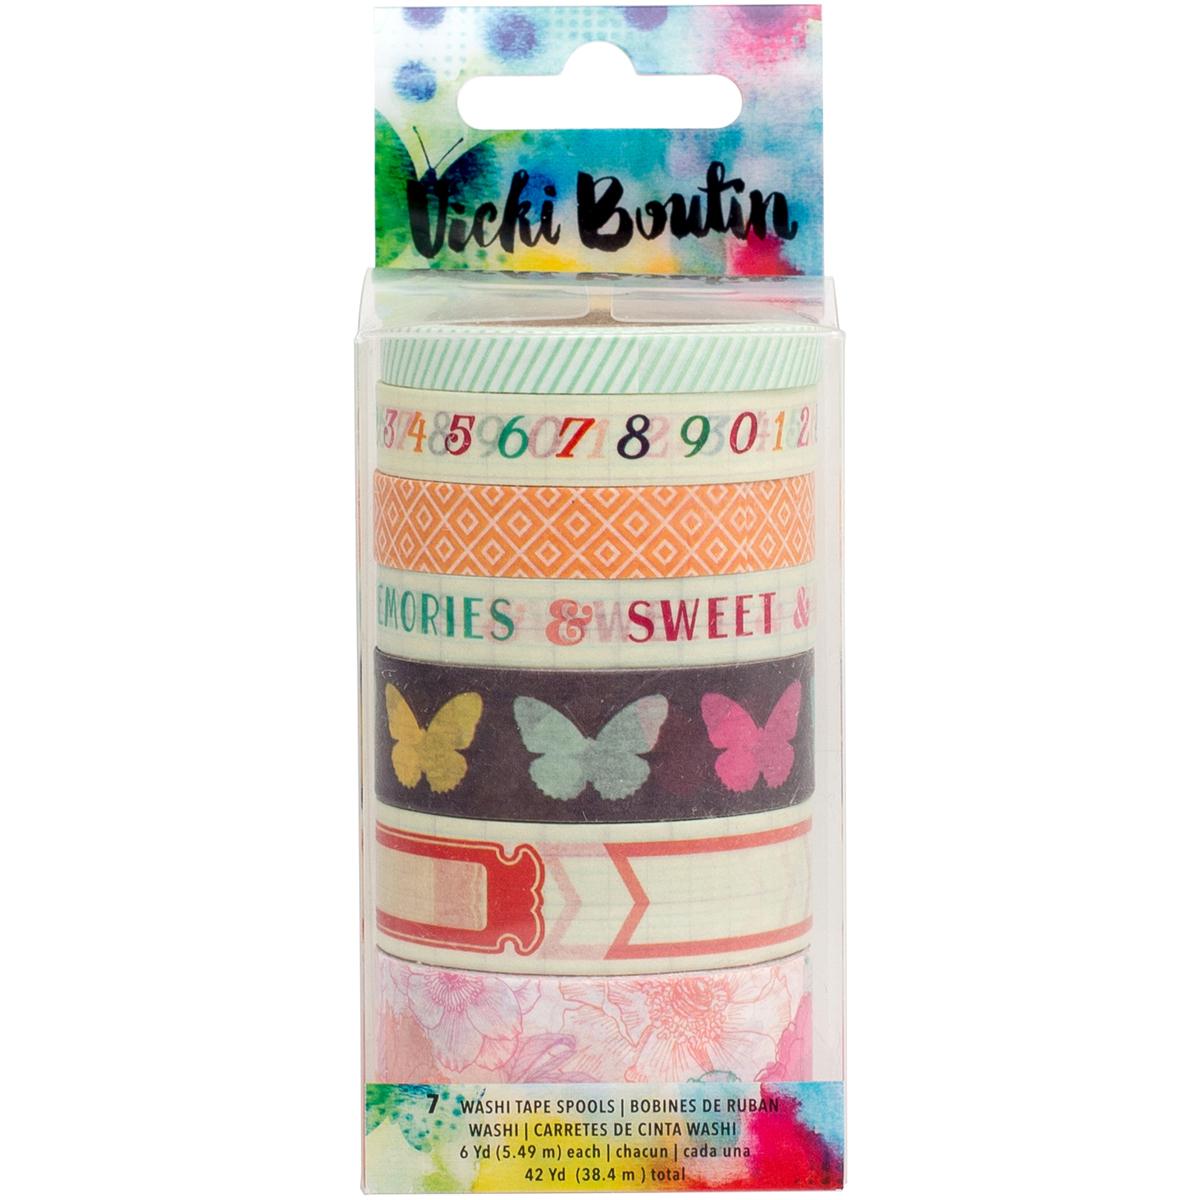 Vicki Boutin Mix ed Media Washi Tape 42 Yards - Color Pop, 7 Designs/6 Yards Each